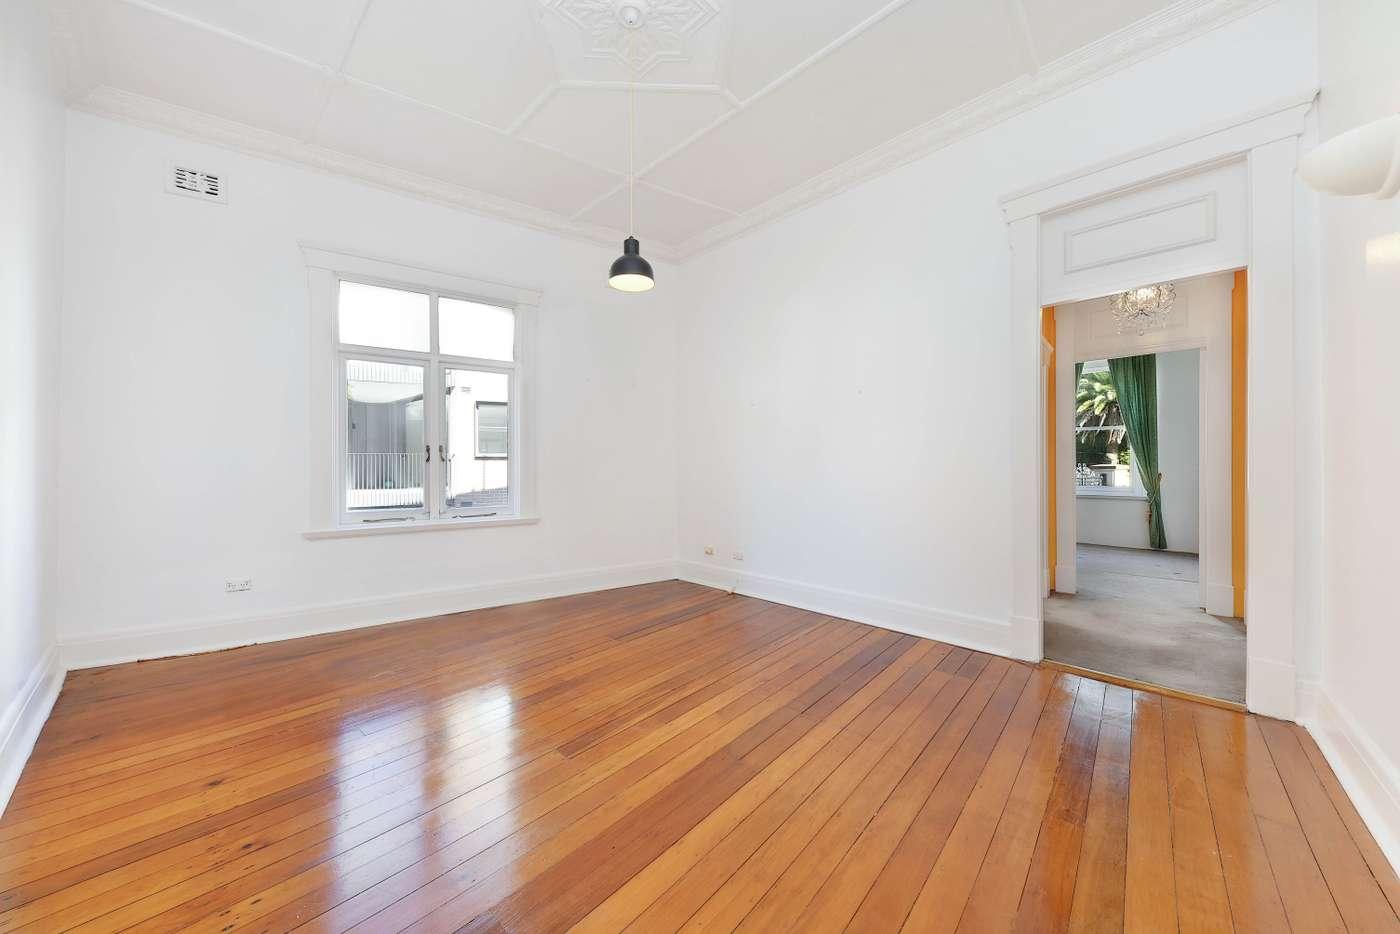 Main view of Homely apartment listing, 8/241 Darlinghurst Road, Darlinghurst NSW 2010